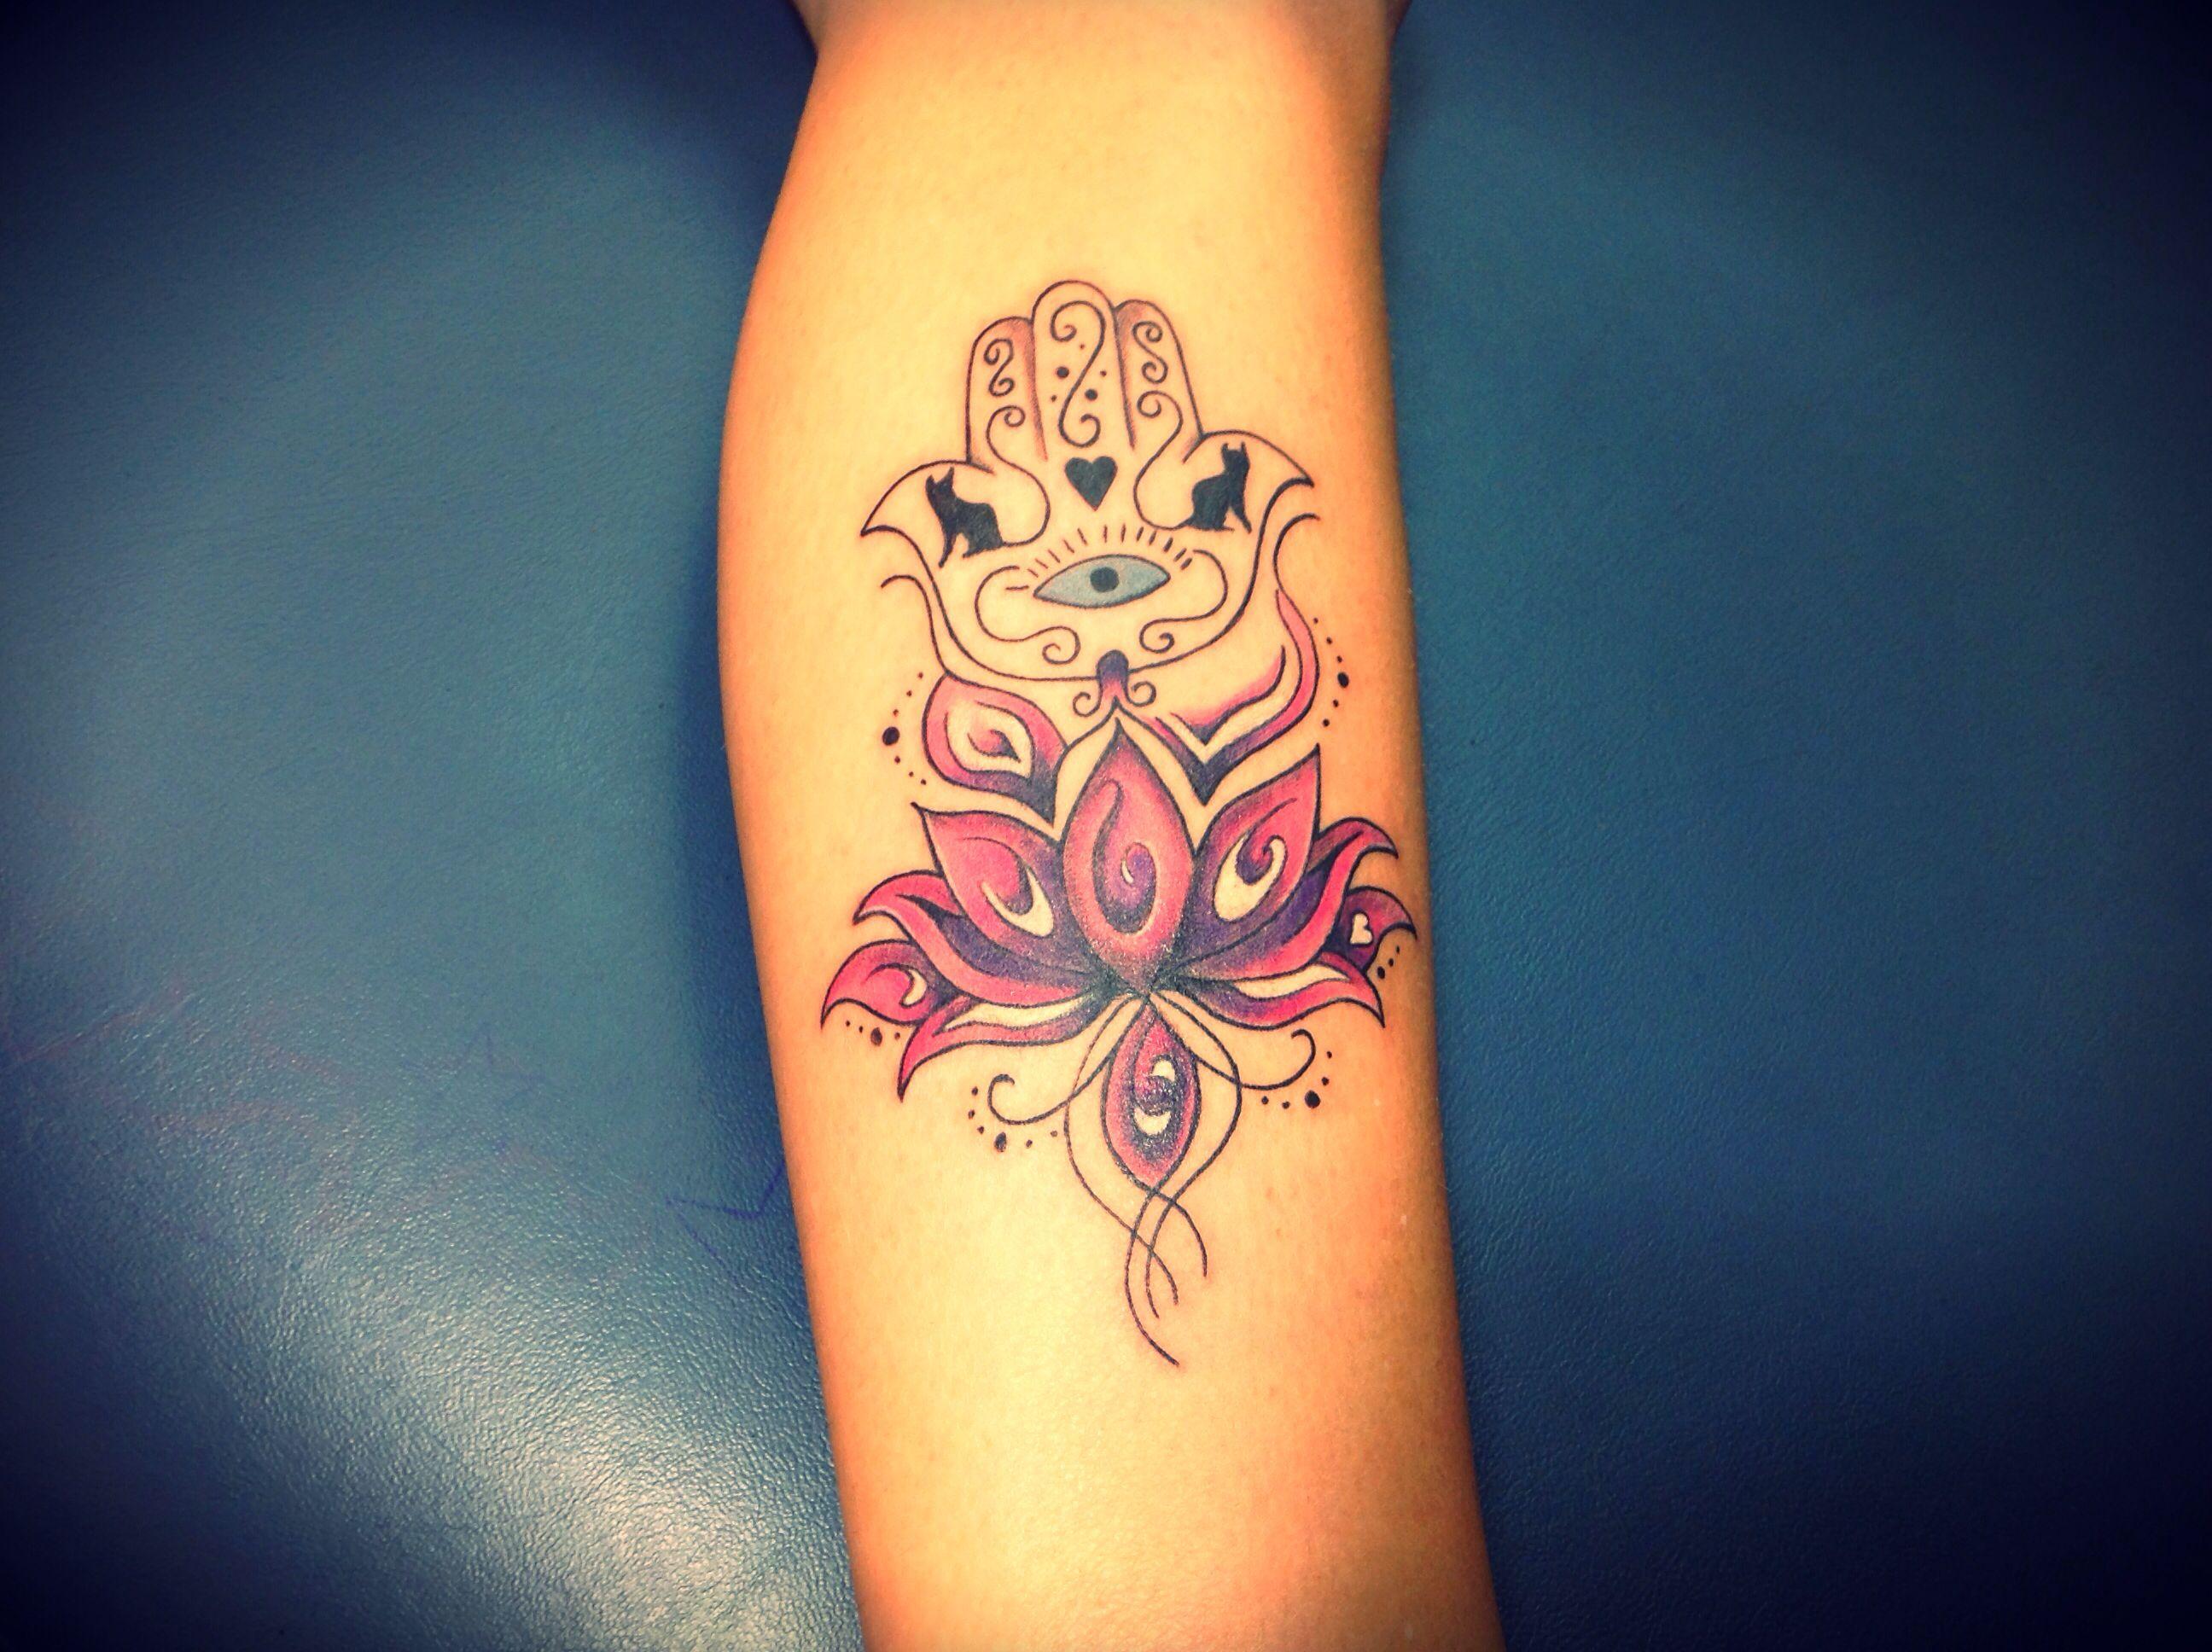 Hamsa hand lotus tattoo with cats Tattoos for women